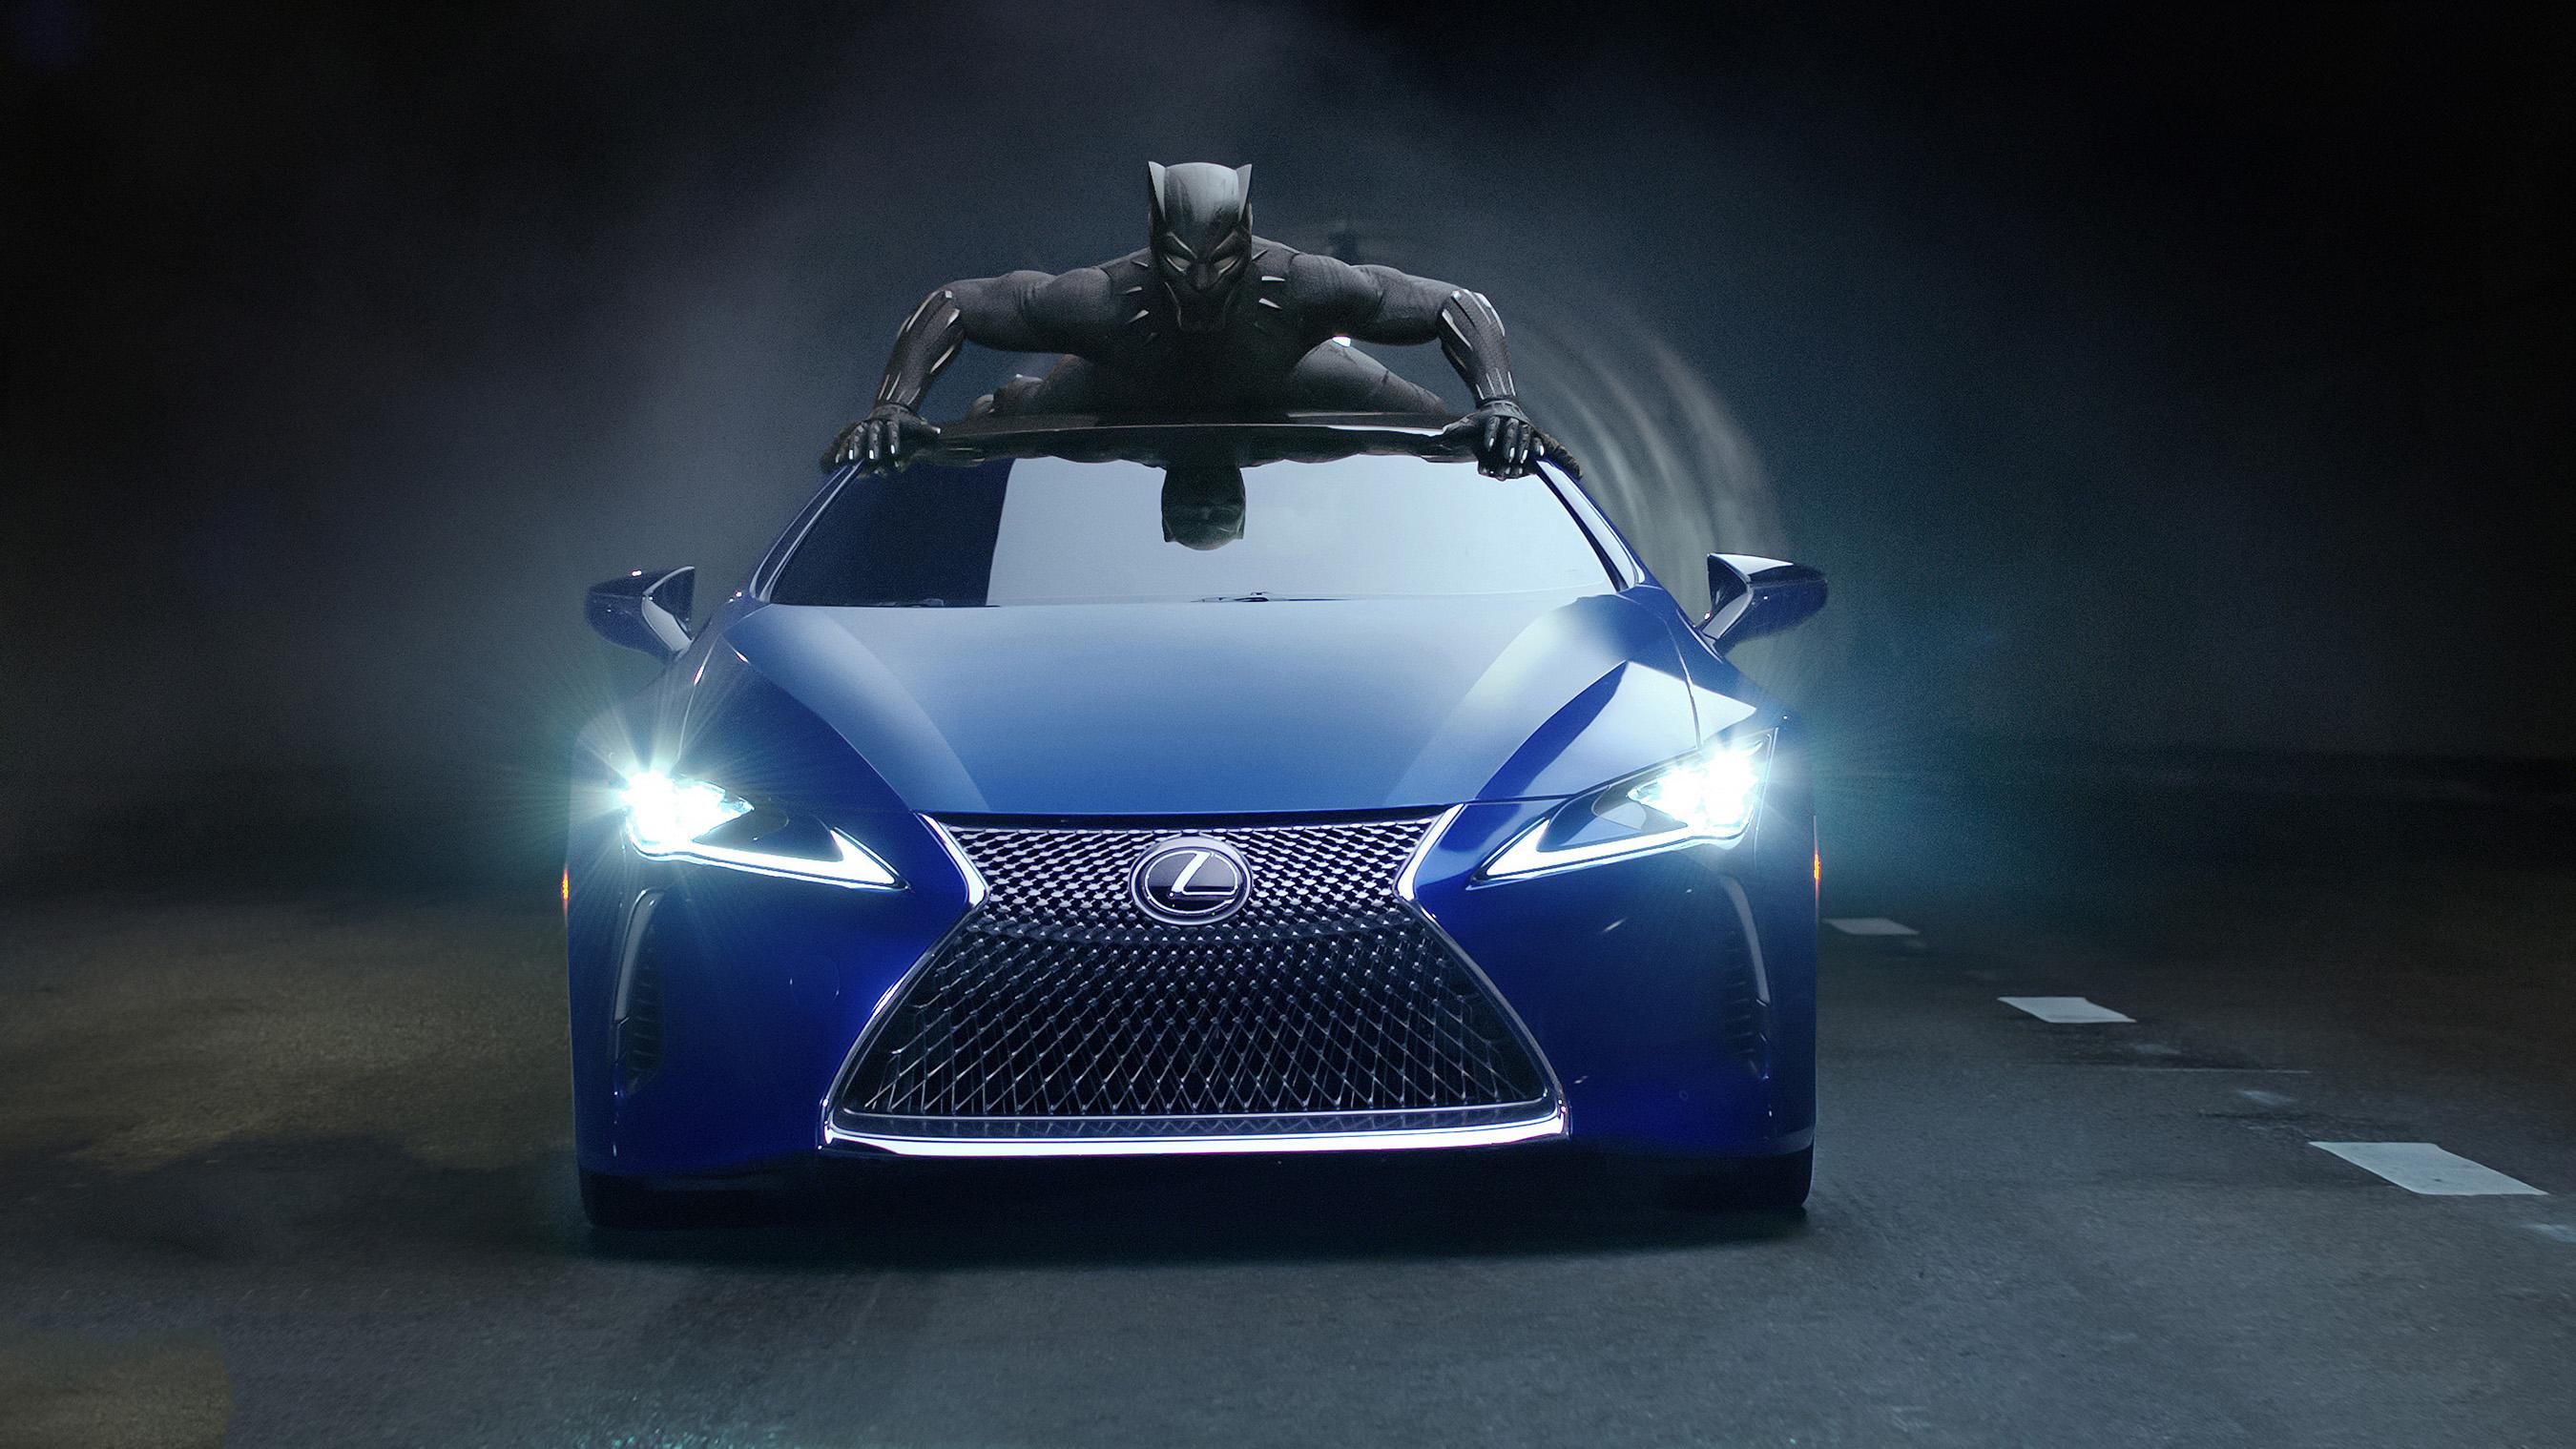 Lexus Black Panther LC 500 2018, HD Cars, 4k Wallpapers ...